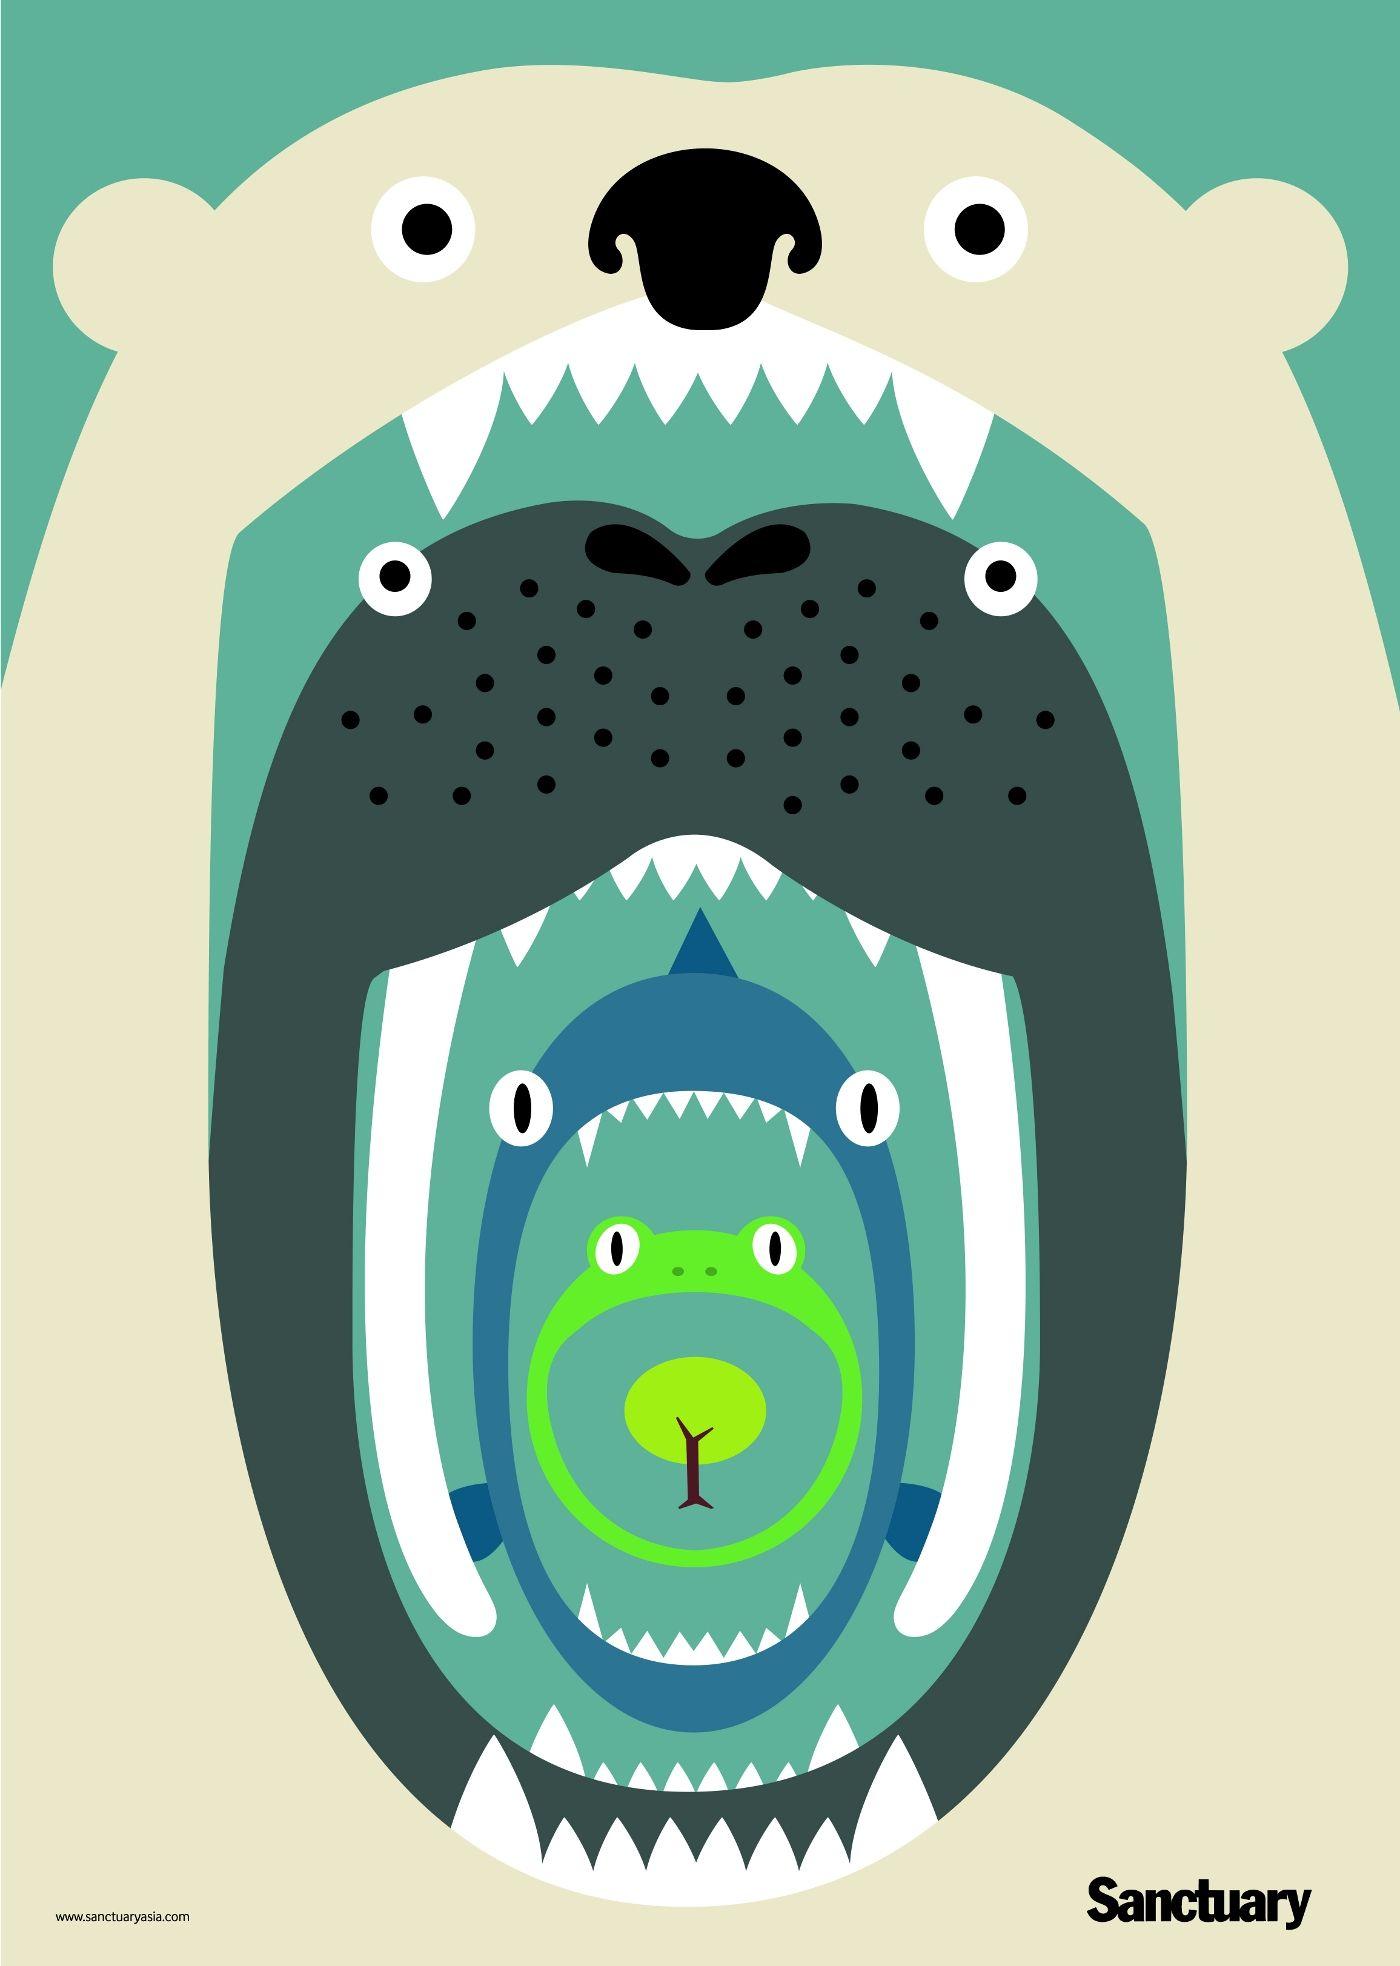 Sanctuary Magazine Mouths Save Trees Ap environmental